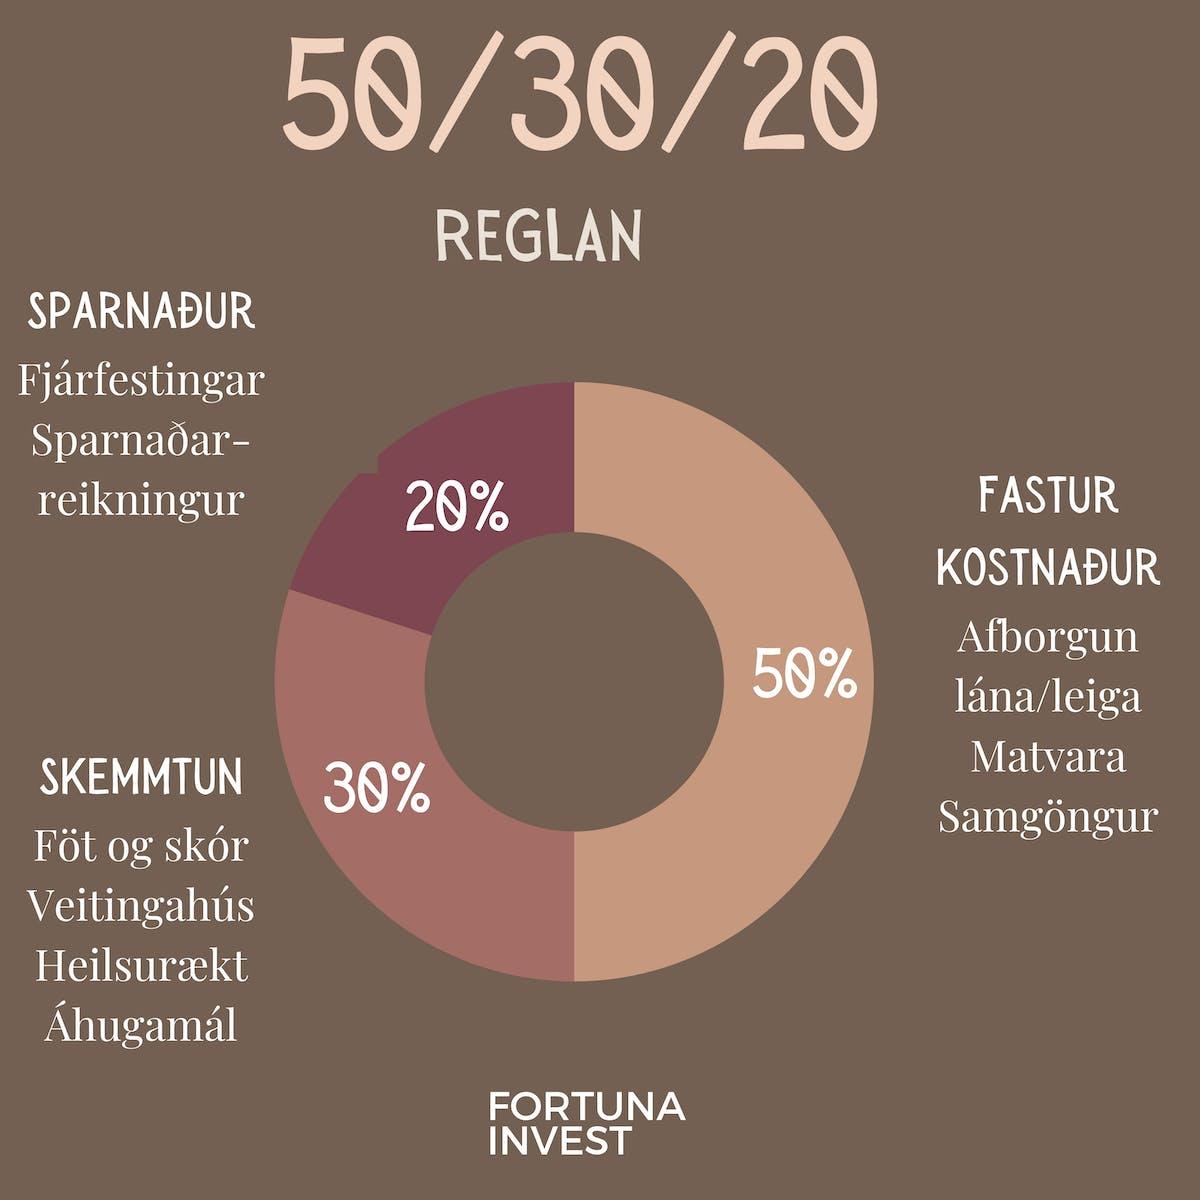 50/30/20 reglan